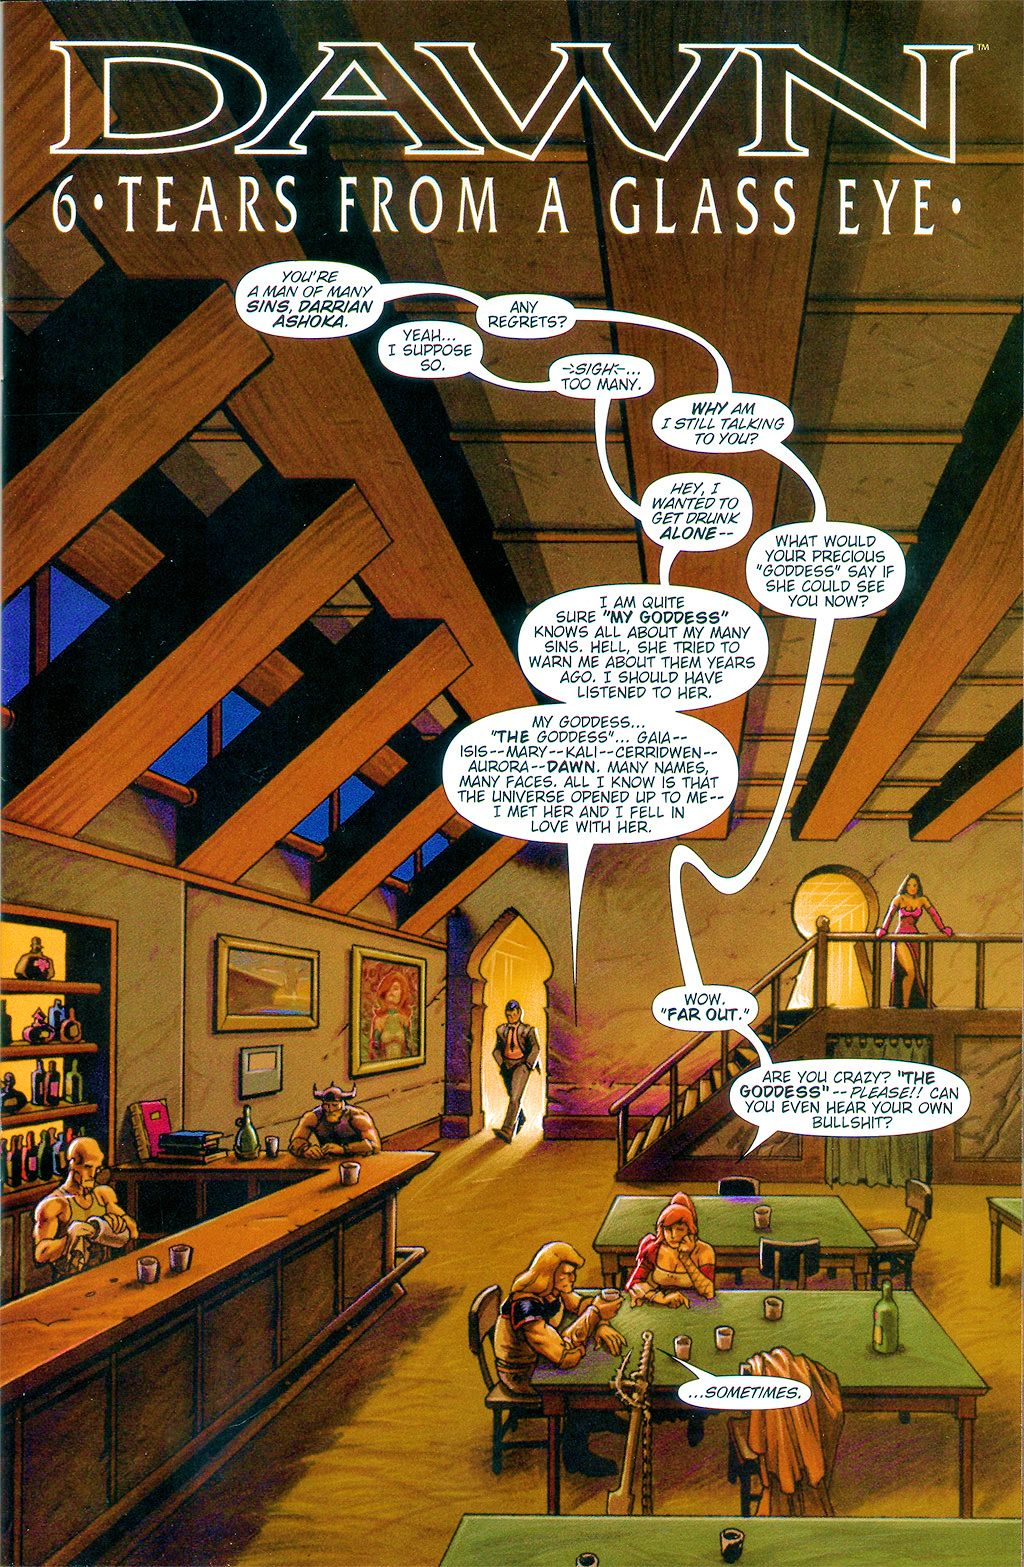 Read online Dawn: Three Tiers comic -  Issue #6 - 3